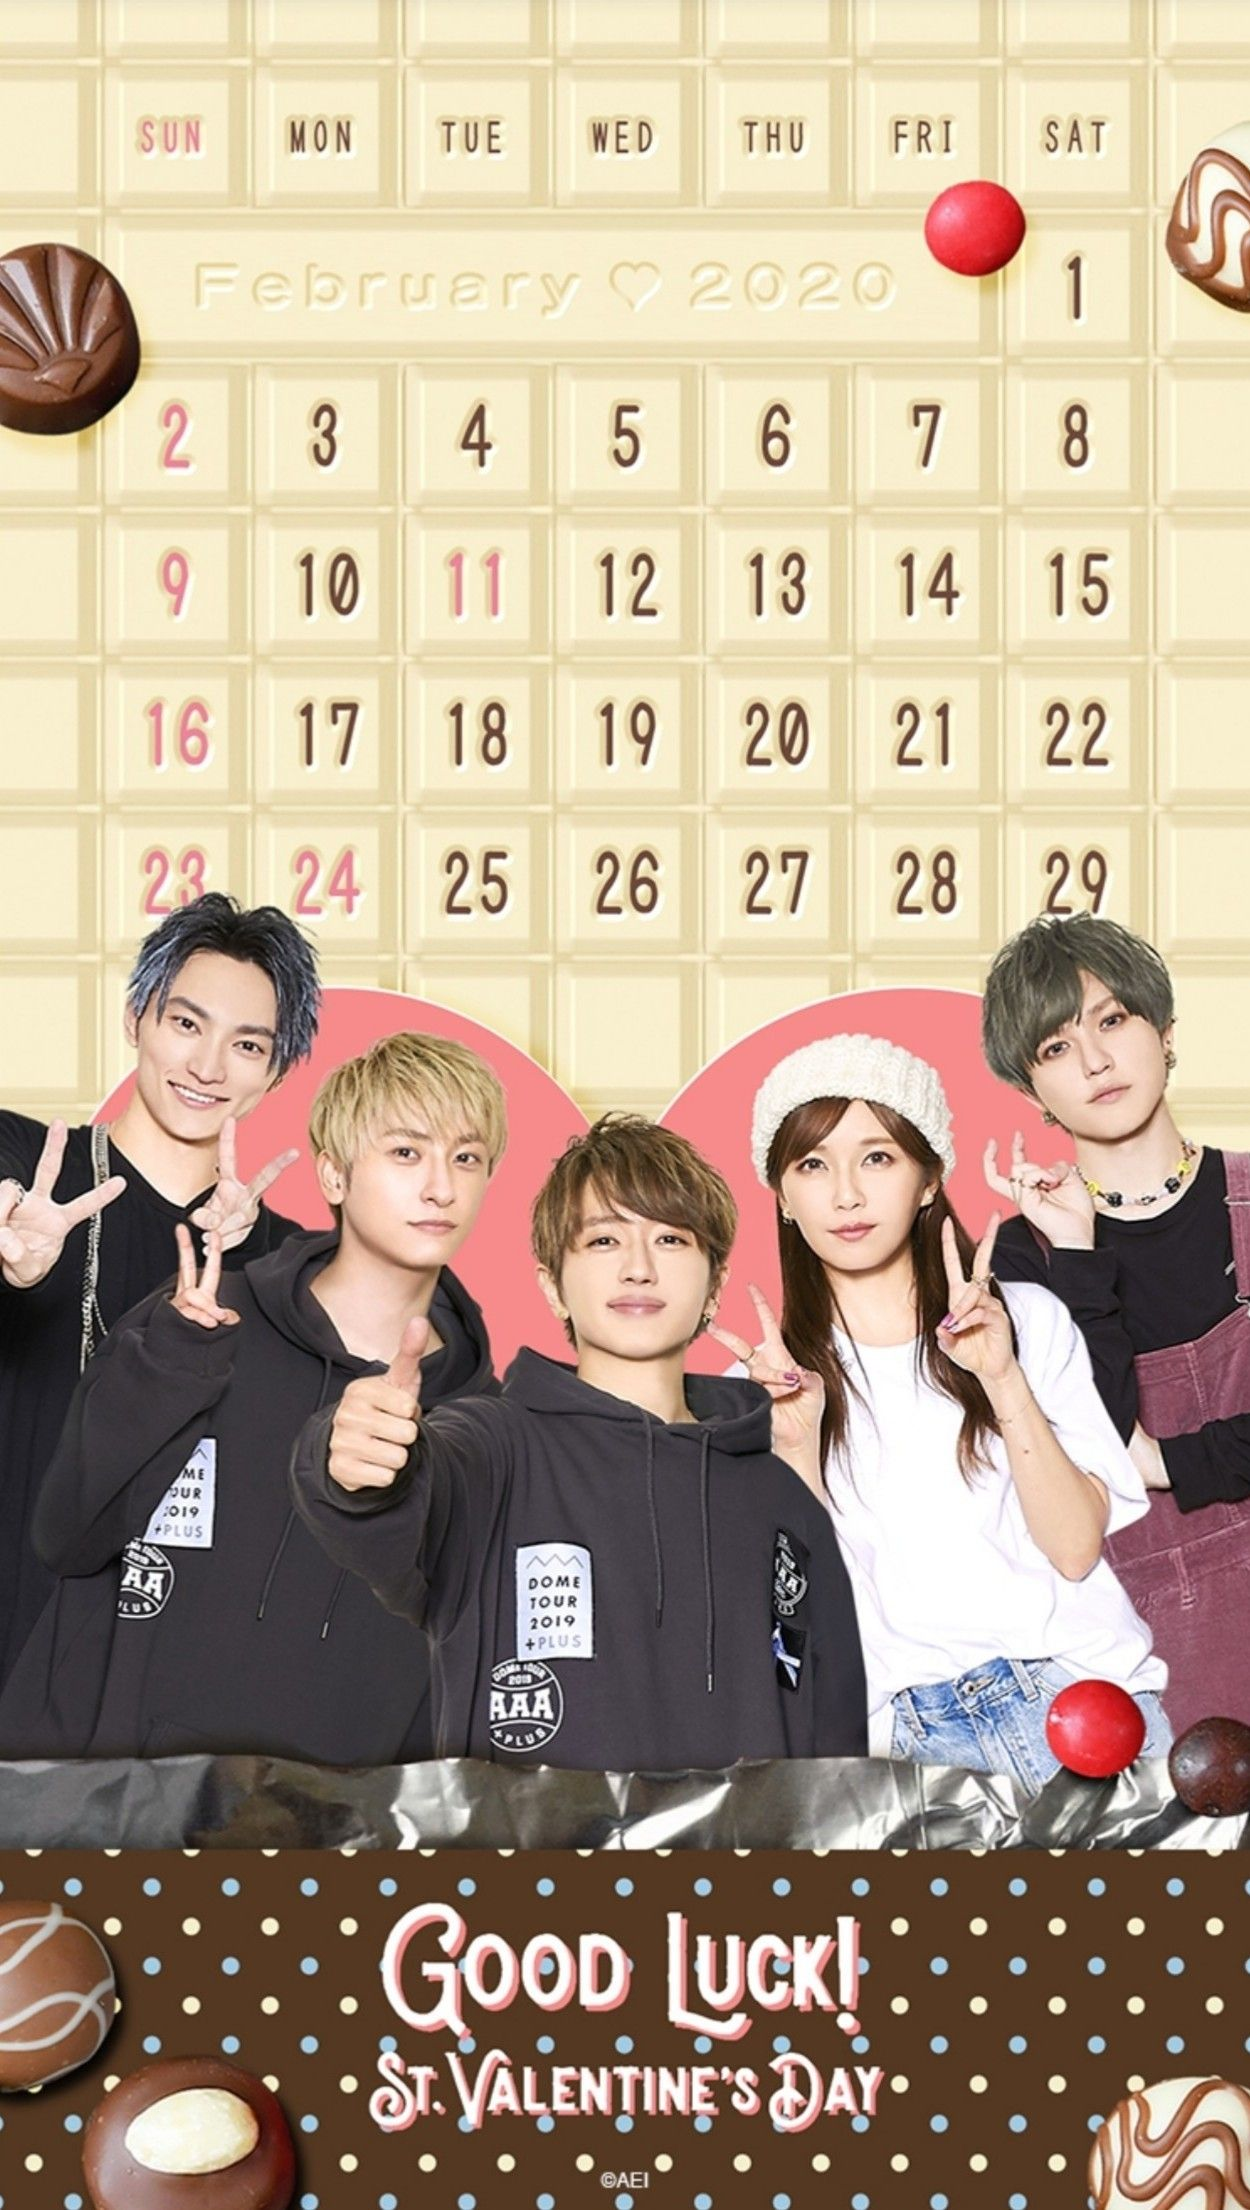 Aaa2月カレンダー 2020 日高光啓 末吉秀太 Aaa メンバー